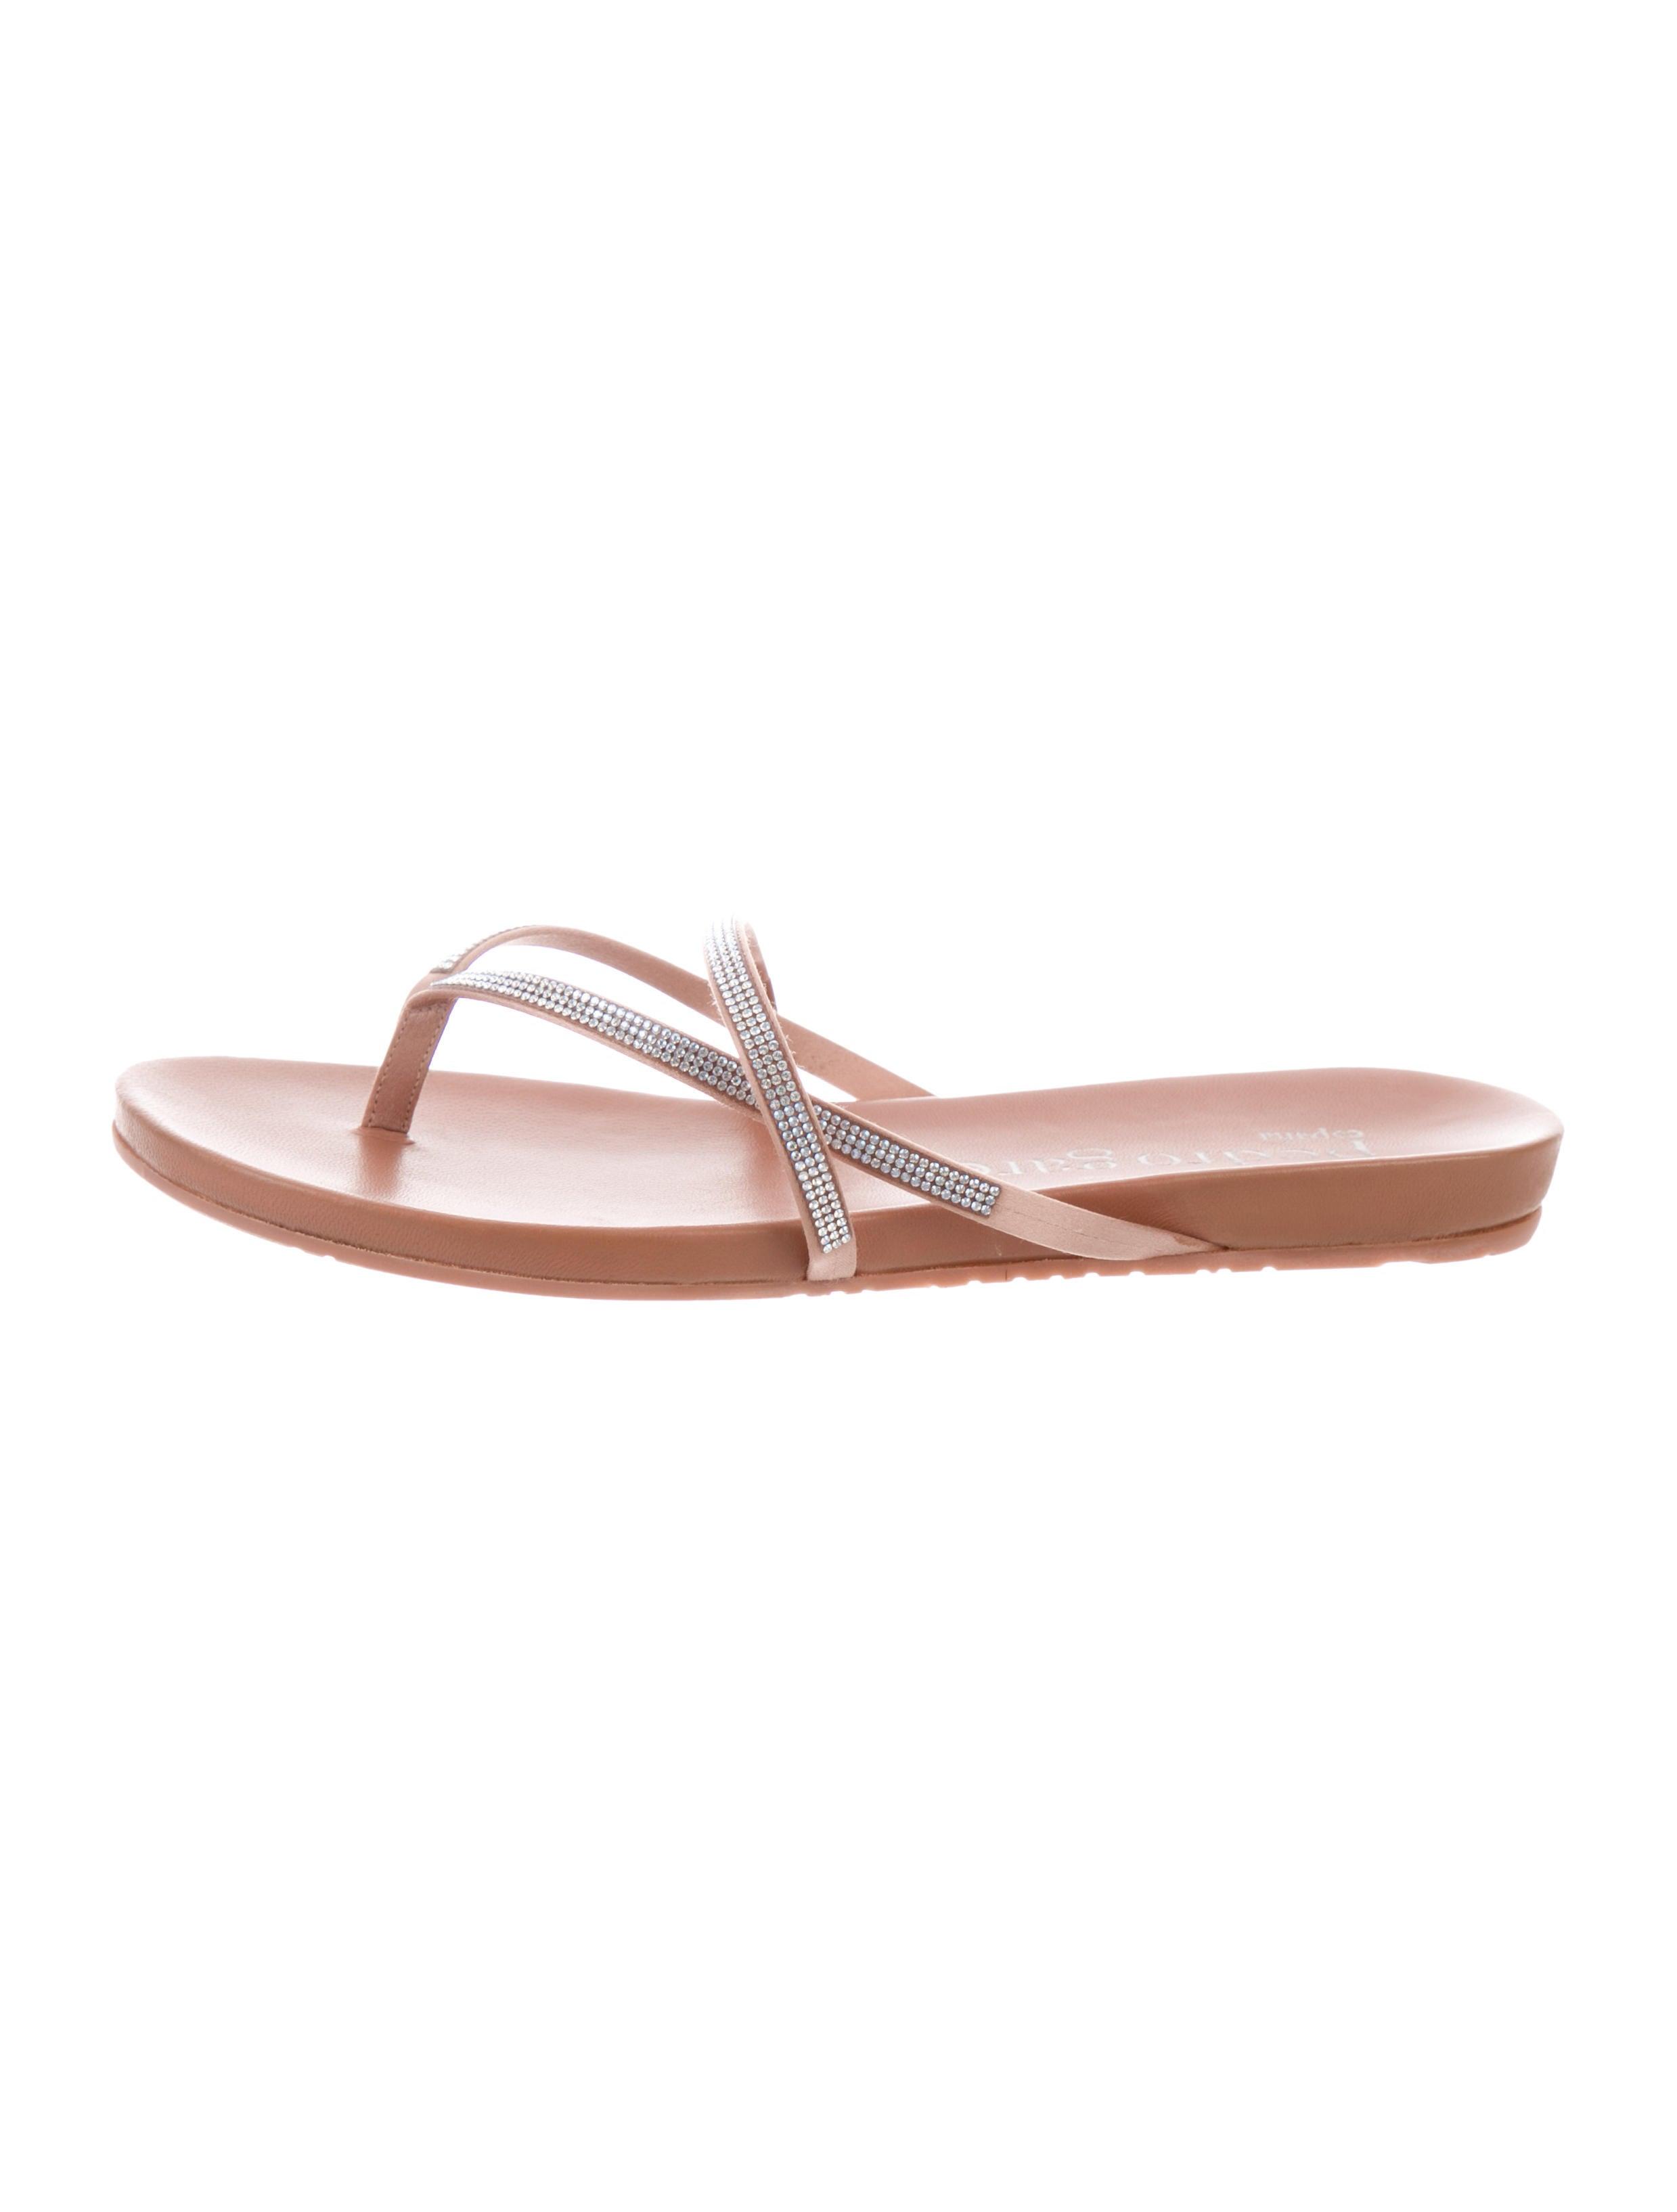 8a0af476c Pedro Garcia Giulia Embellished Sandals w  Tags - Shoes - PED27949 ...